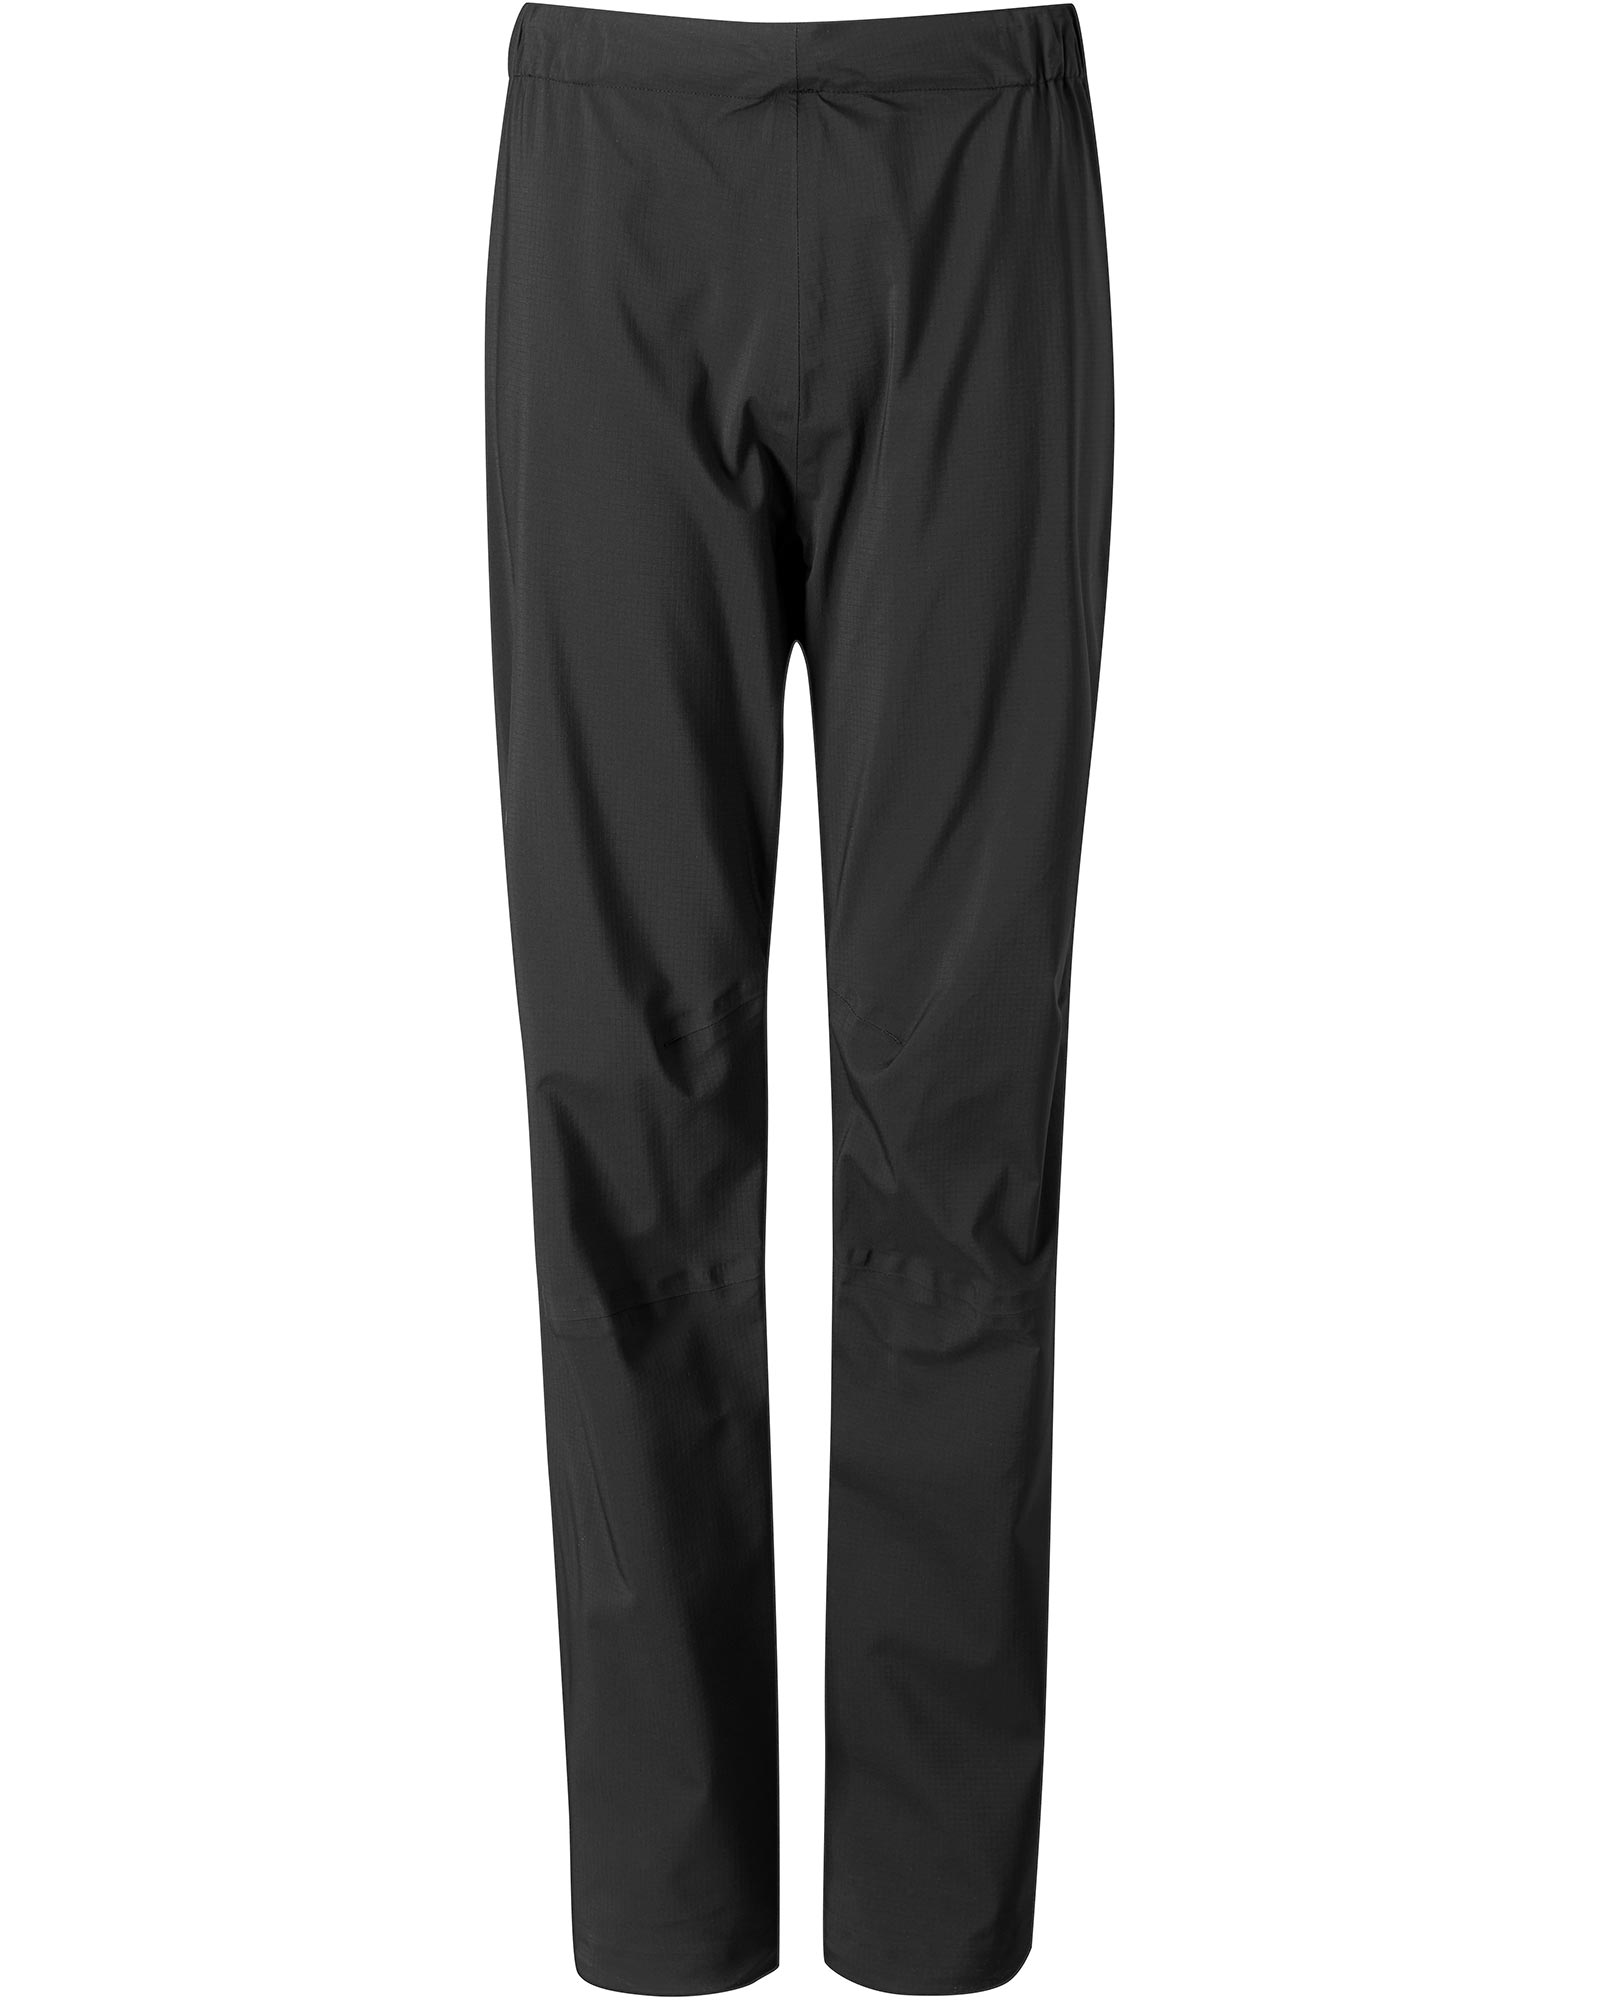 Rab Women's Firewall Pertex Shield Pants Black 0